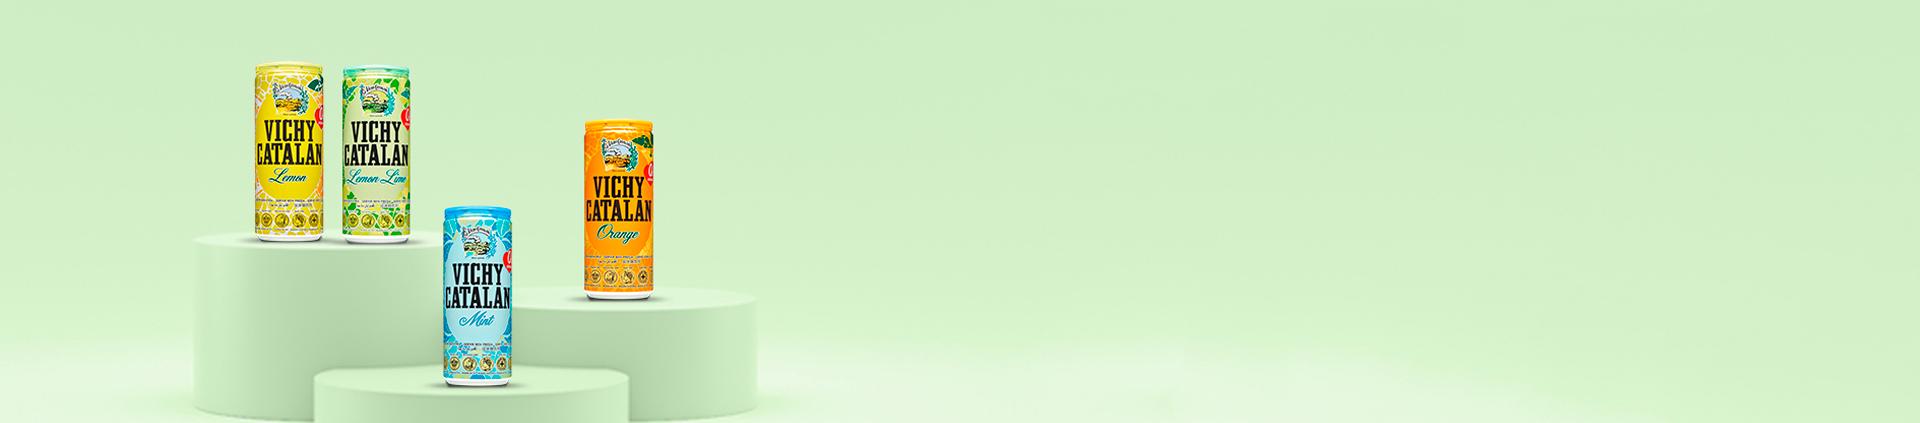 Comprar Agua con Sabores de Vichy Catalán sin azúcar